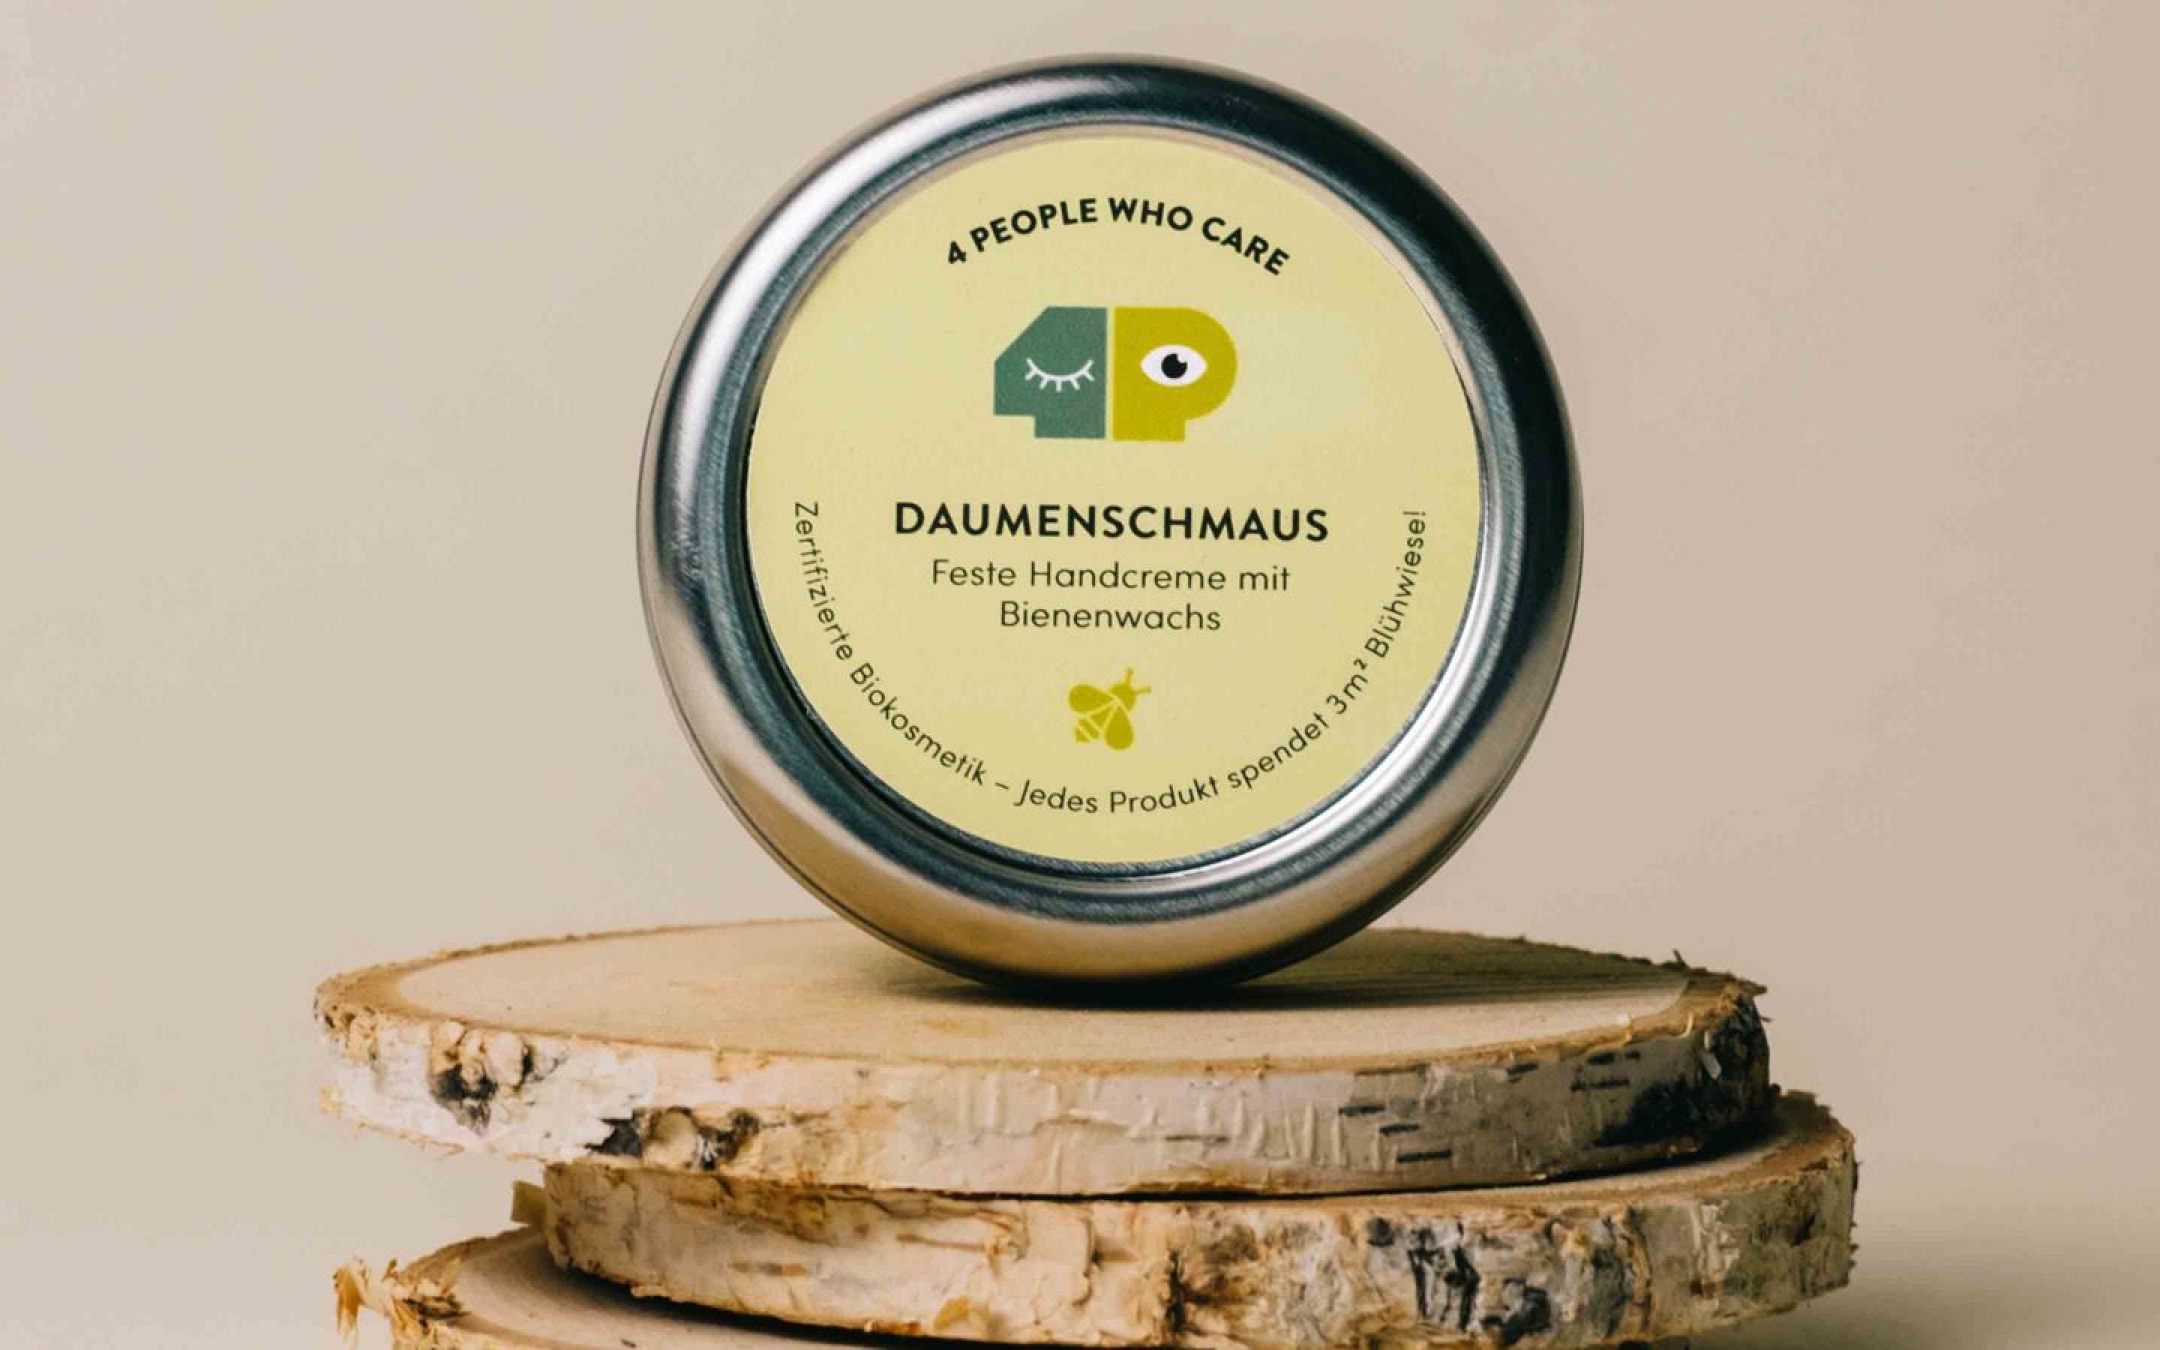 Daumenschmaus-solid handlotion